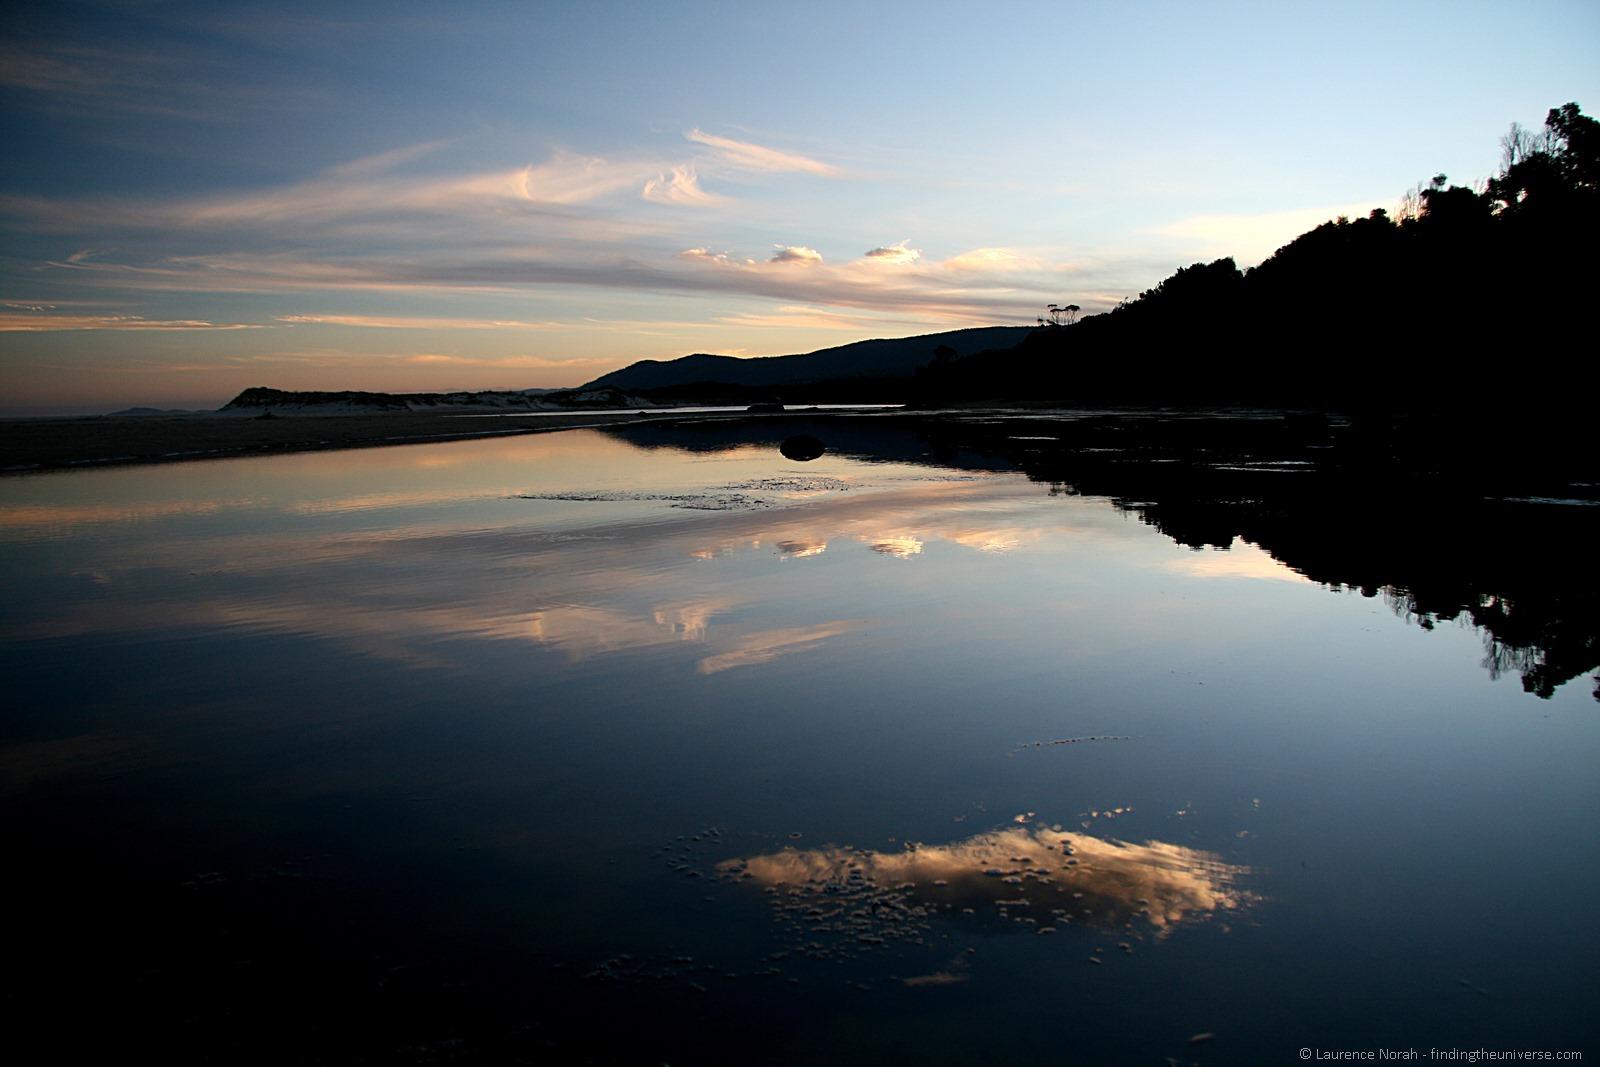 Nube riflessione spiaggia laguna Tasmania